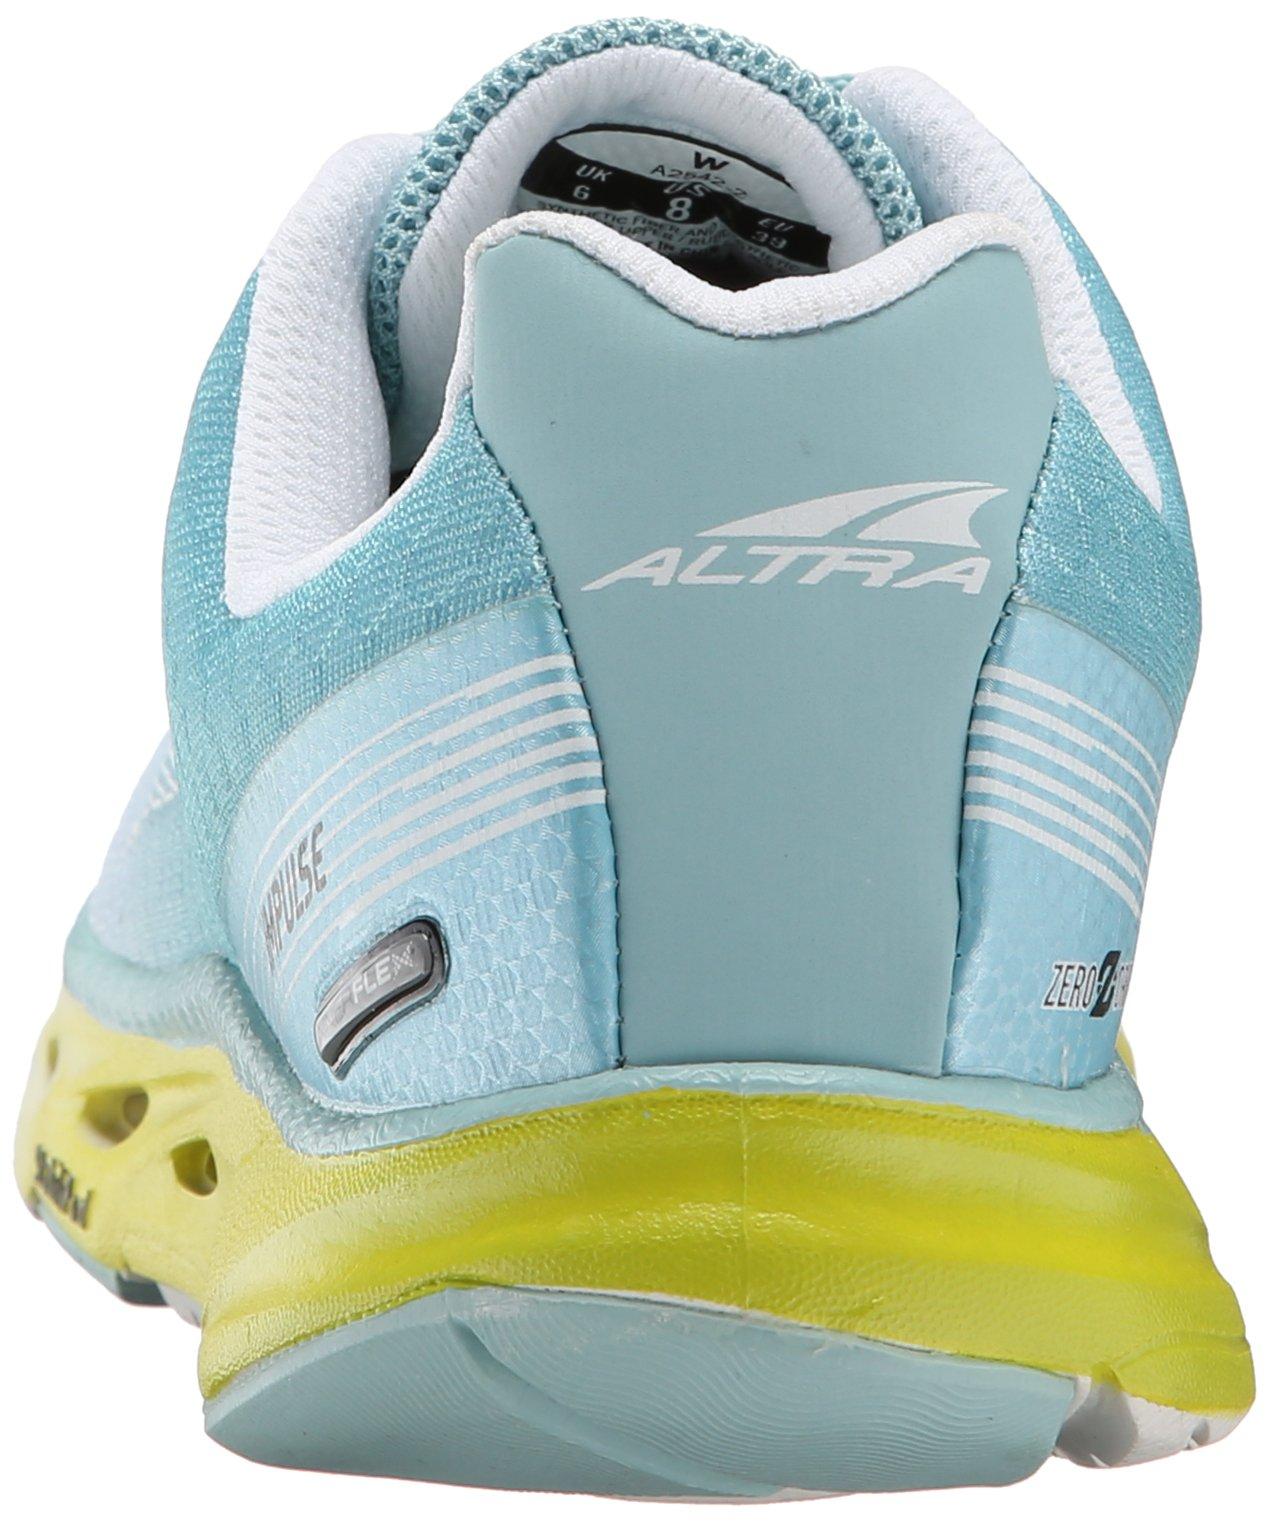 71lUrUYw%2BlL - Altra Women's Impulse Running Shoe